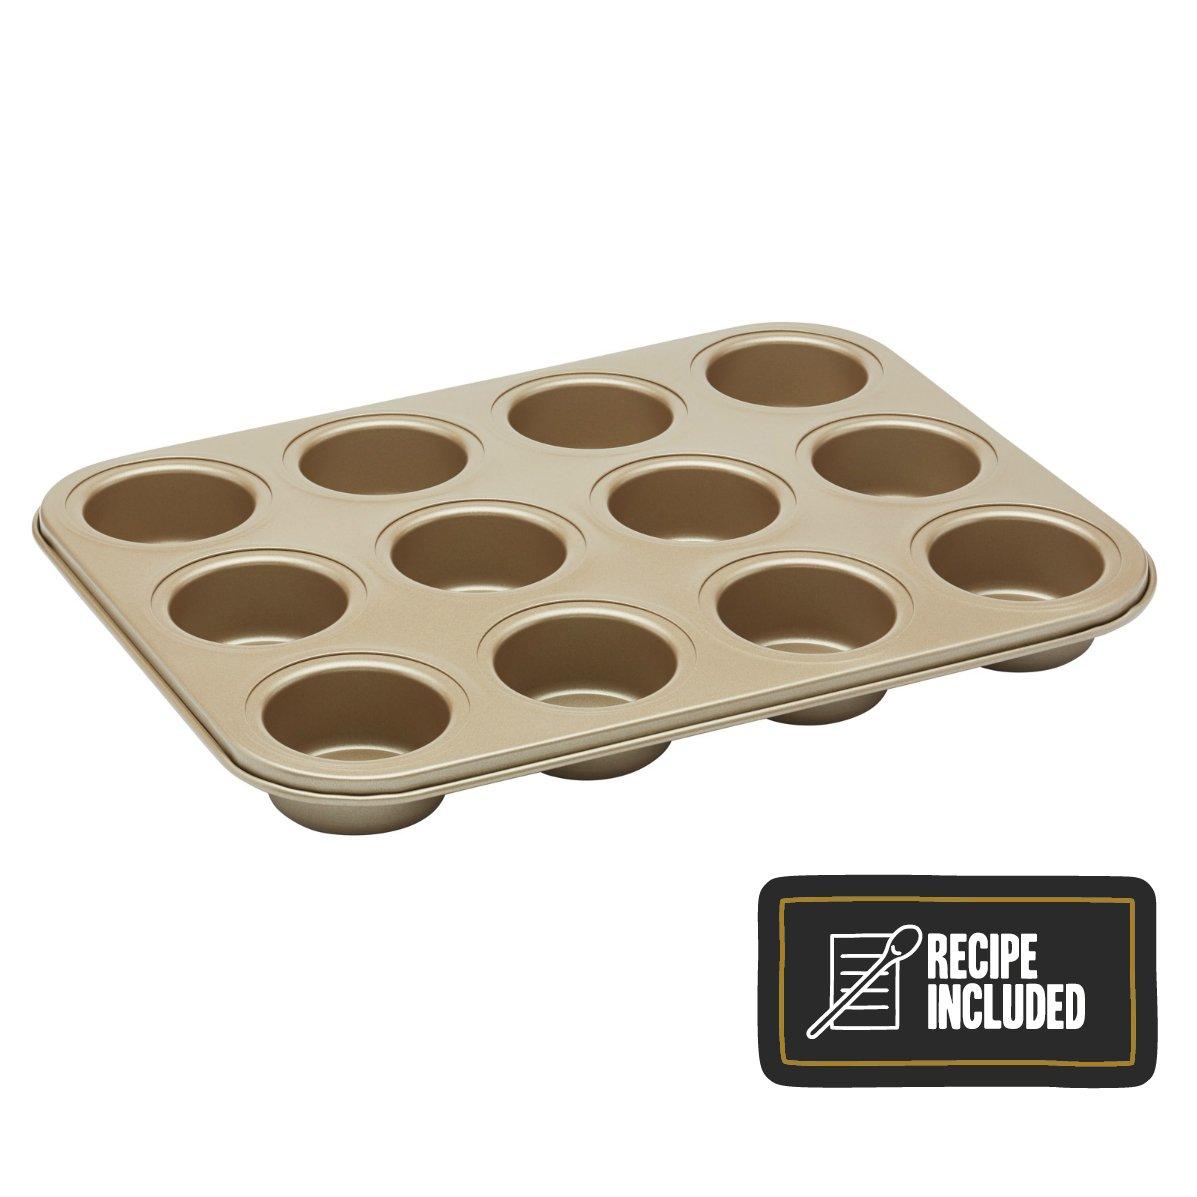 Paul Hollywood 12 Hole Deep Baking Pan, Non-stick